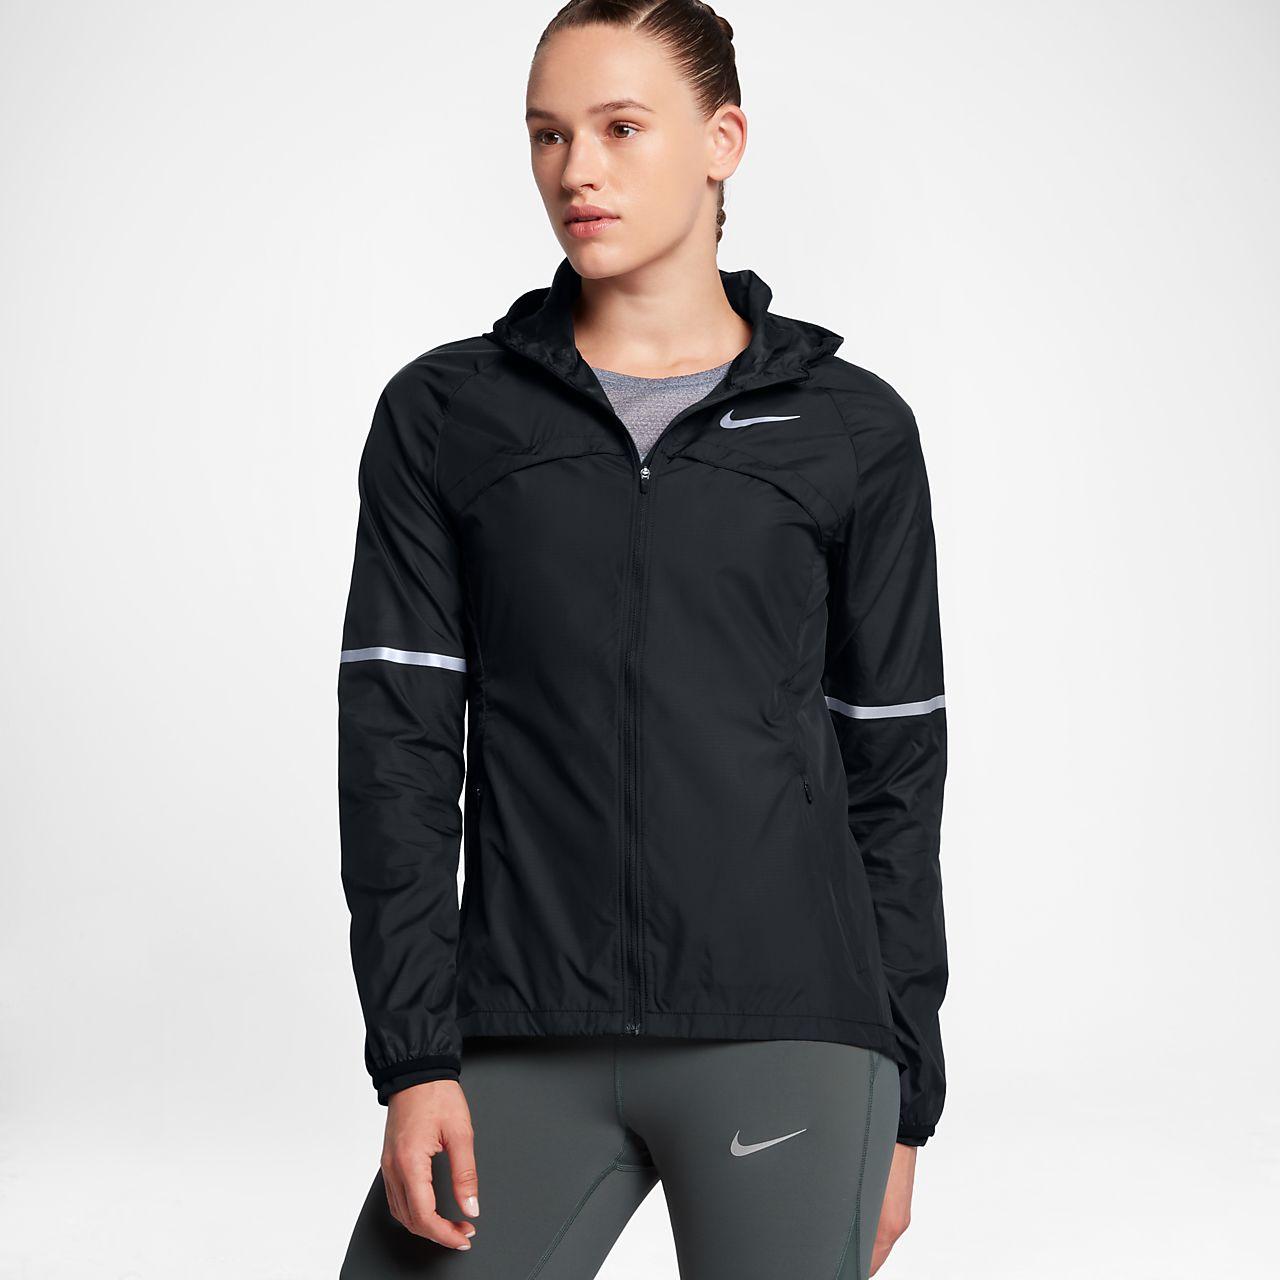 8f9fc6bc8eb5 Low Resolution Nike Shield Women s Running Jacket Nike Shield Women s  Running Jacket